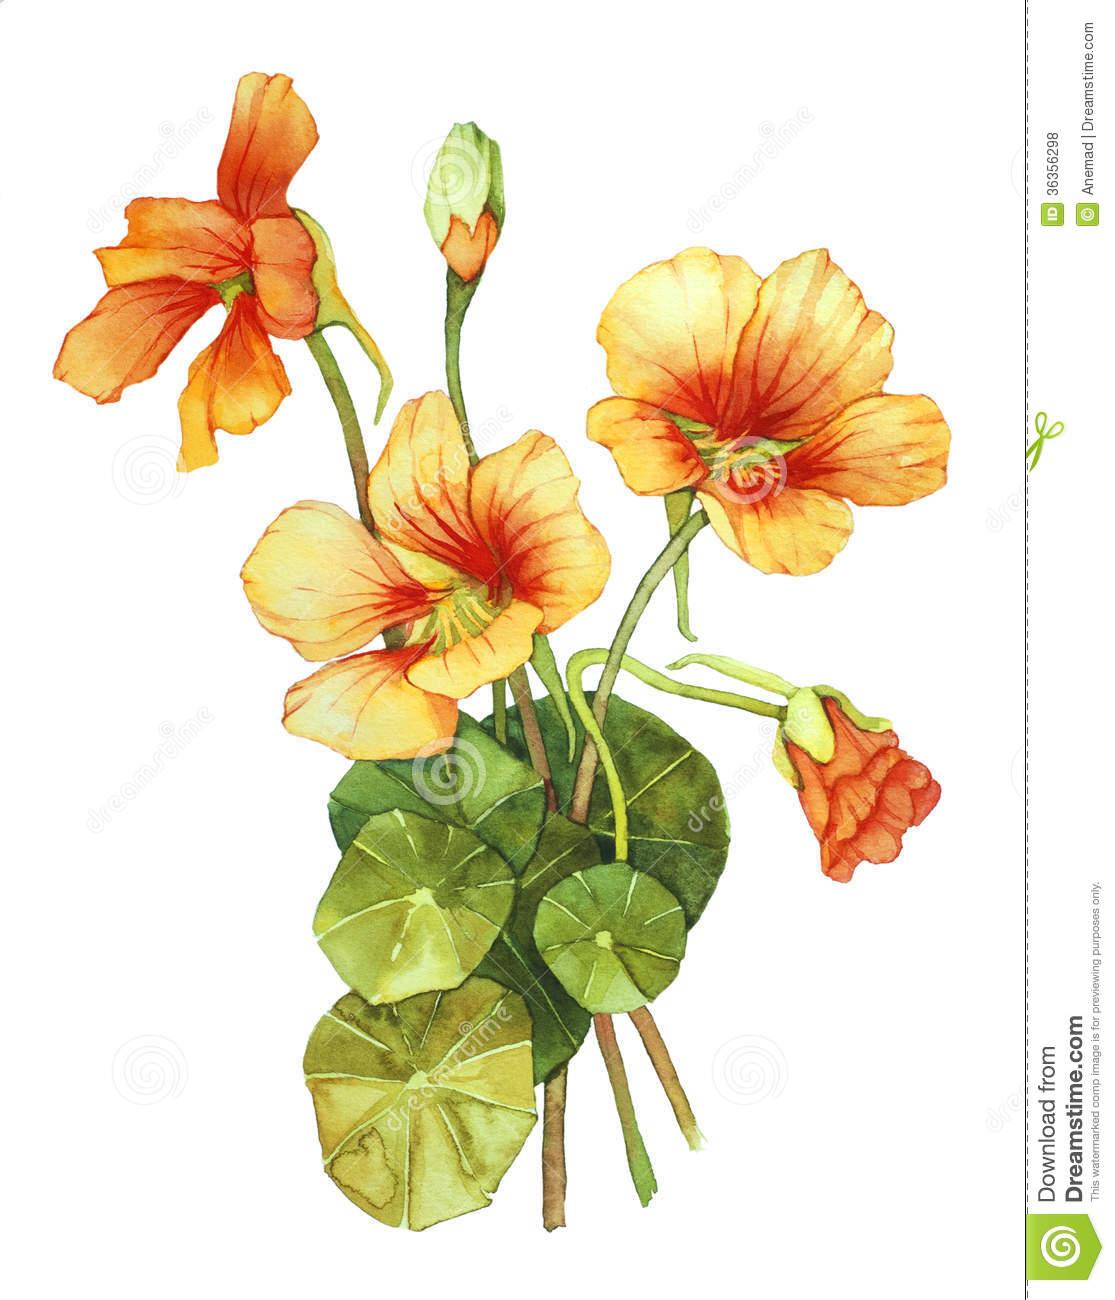 Watercolor With Nasturtium Royalty Free Stock Photos.